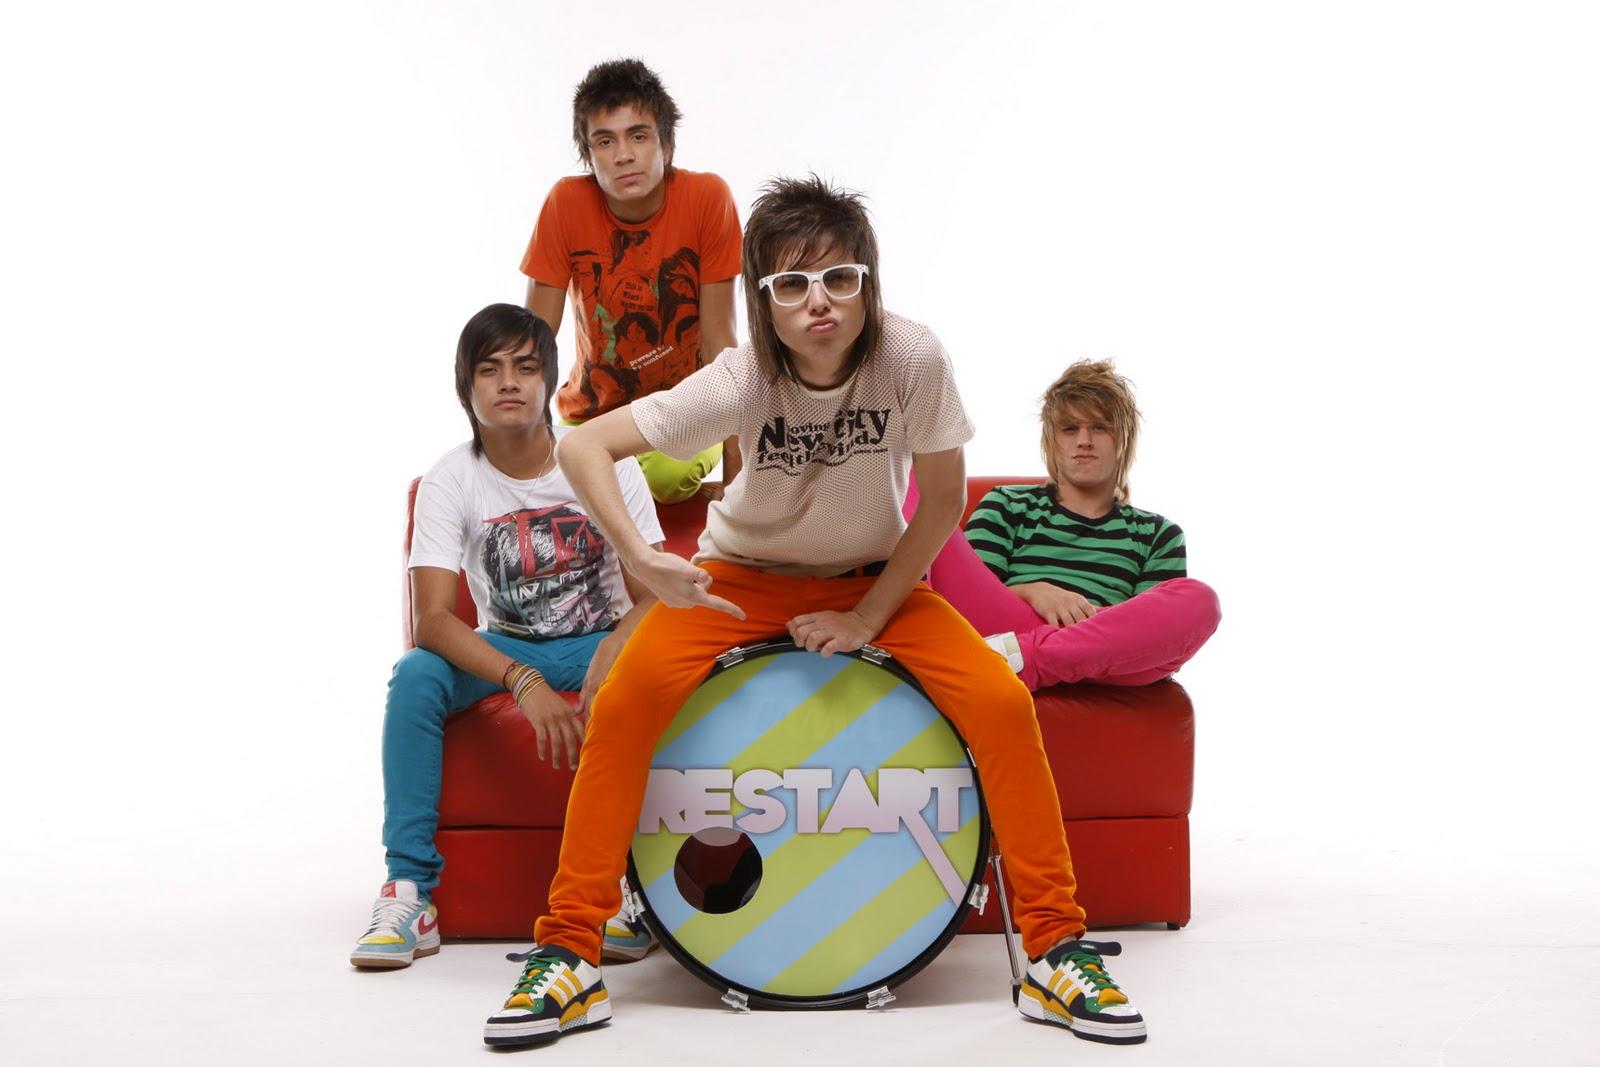 5338712e9bd9c Fenômeno teen toca no projeto NATAL TEEN FEST e promete lotar a casa com fãs  de roupas e óculos Ray Ban Wayfarer vibrantes